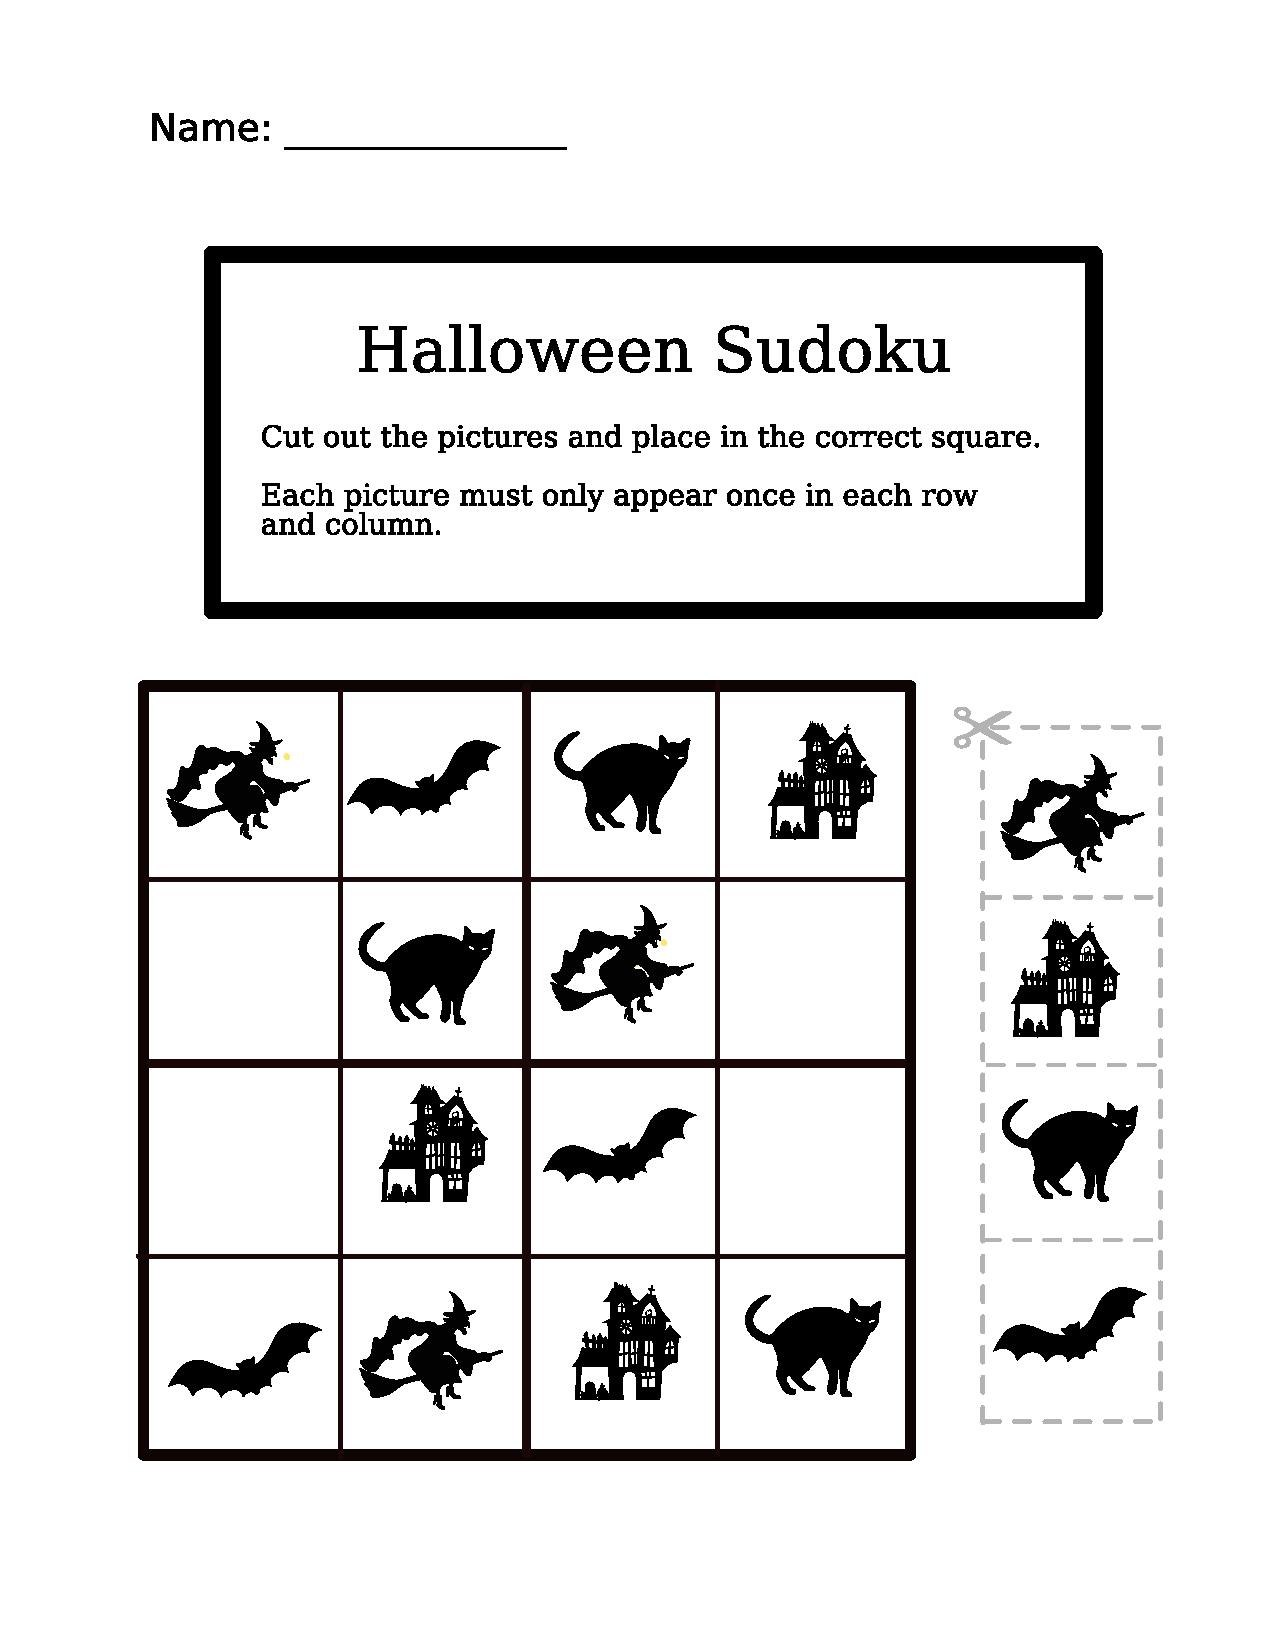 sudoku pdf - Kubre.euforic.co